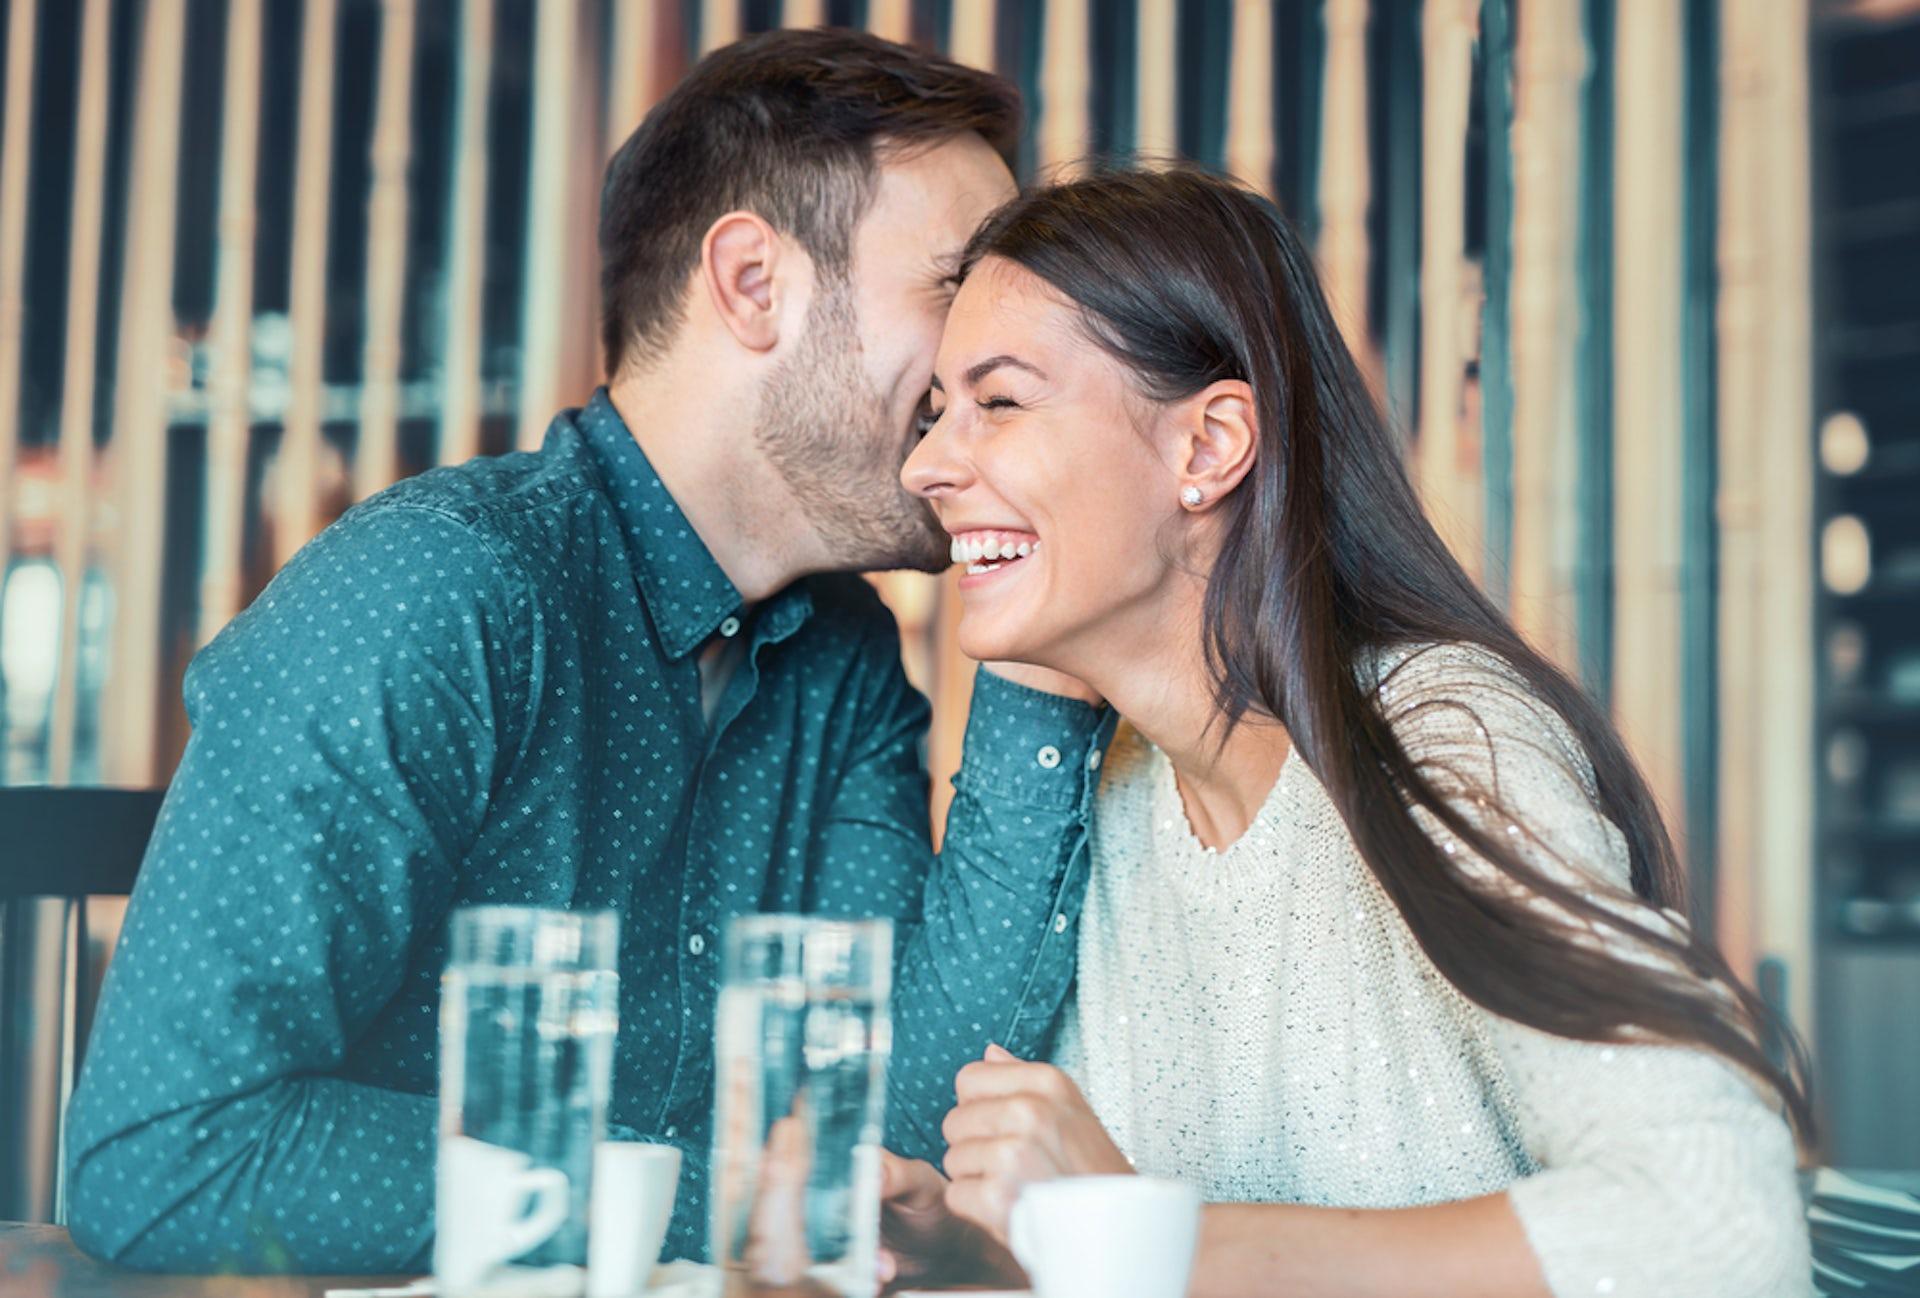 Raise your voice castellano online dating